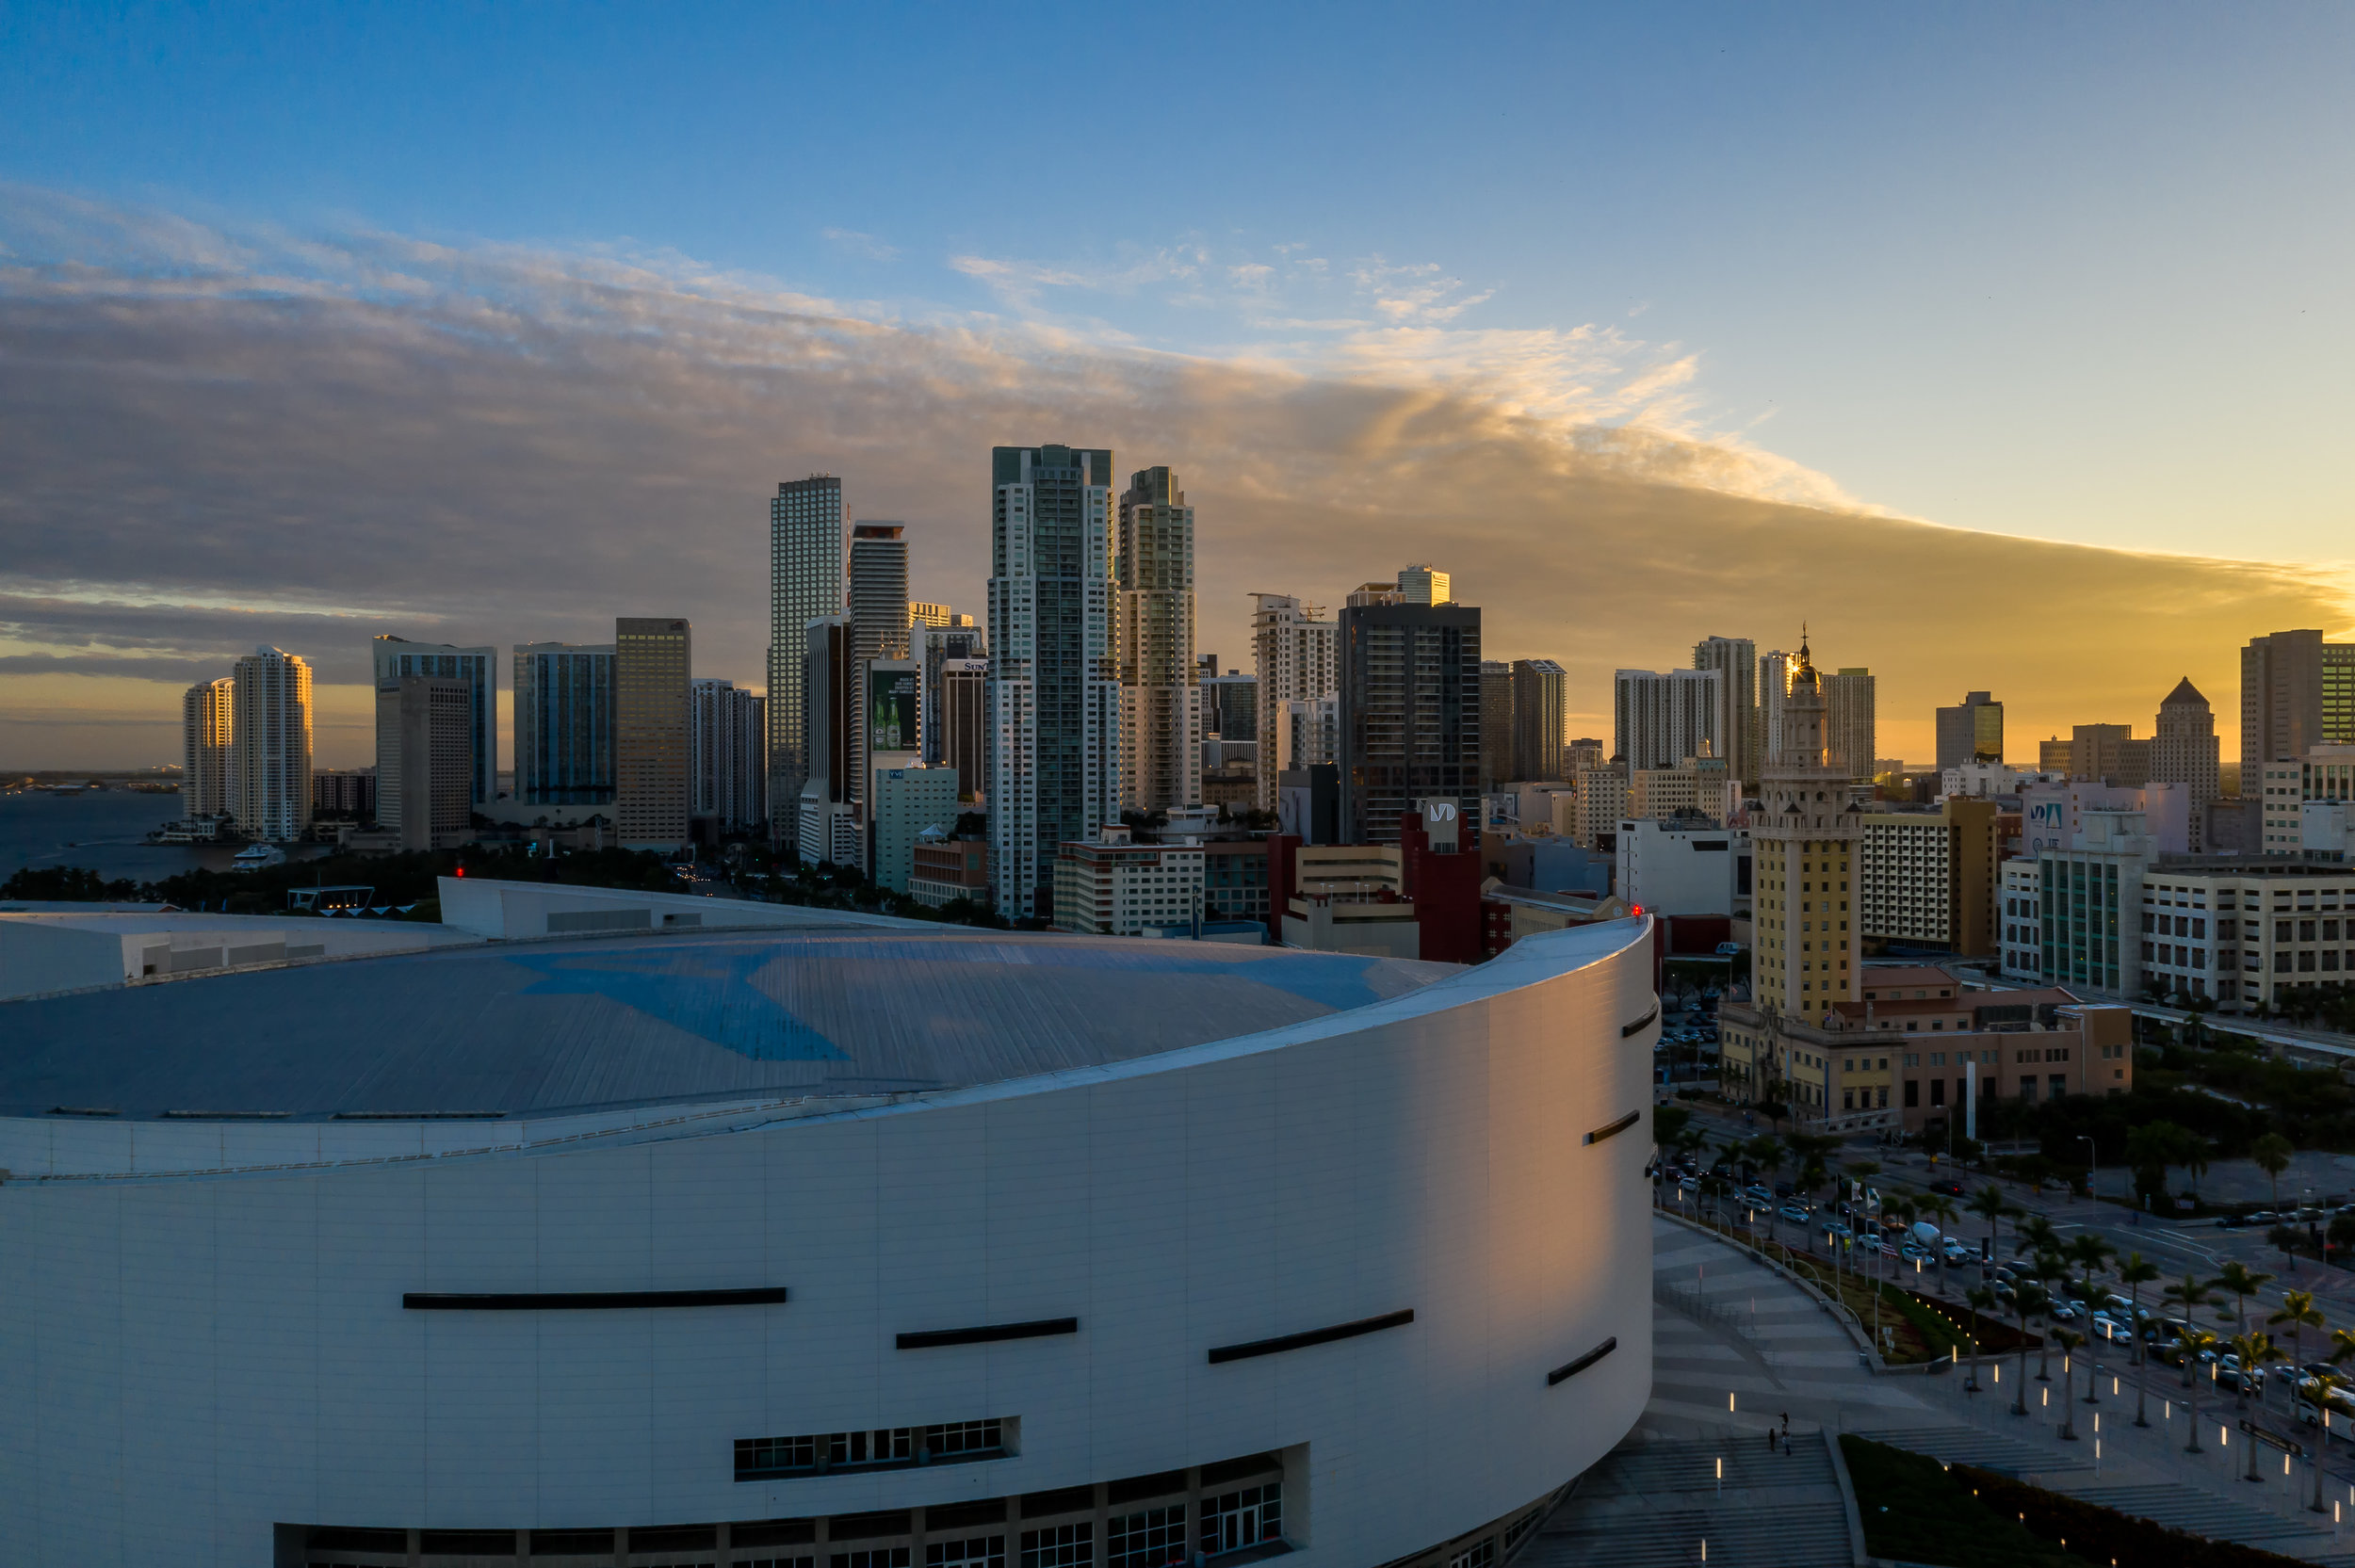 Architecure Photography Miami-.jpg